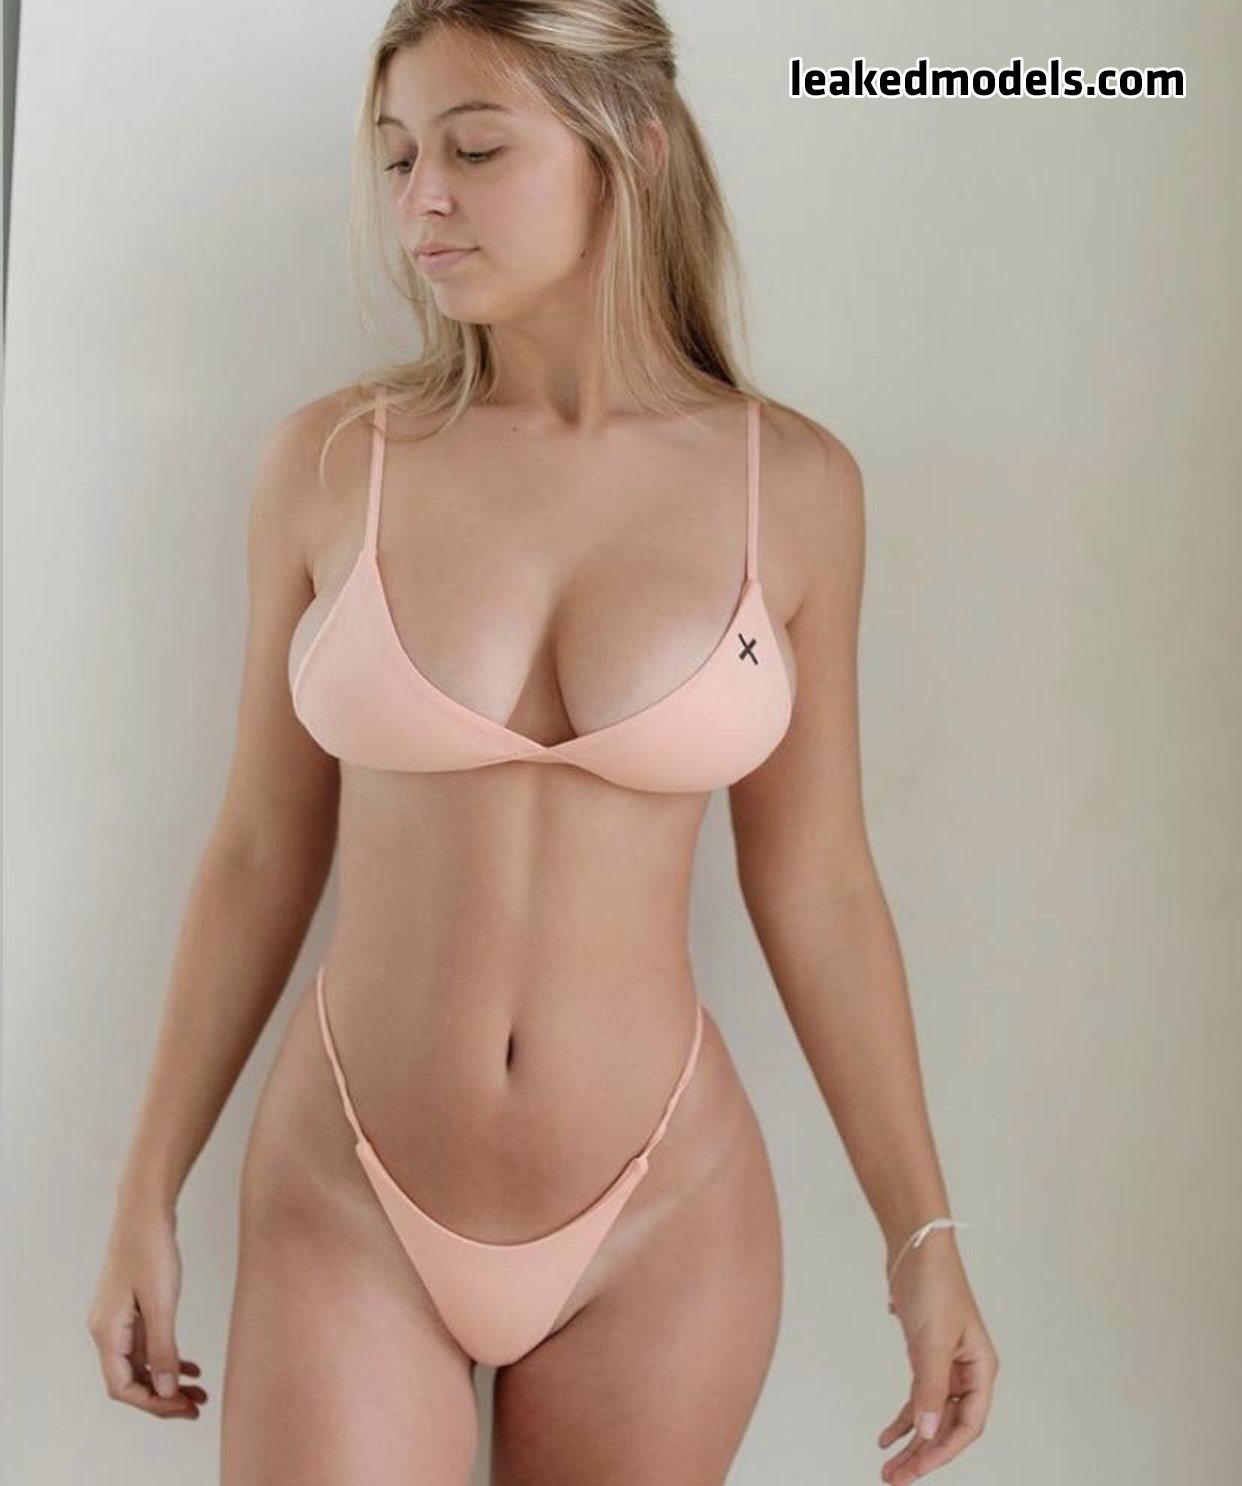 maddy maye leaked nude leakedmodels.com 0003 - Maddy Maye – maddymayee Instagram Sexy Leaks (37 Photos)